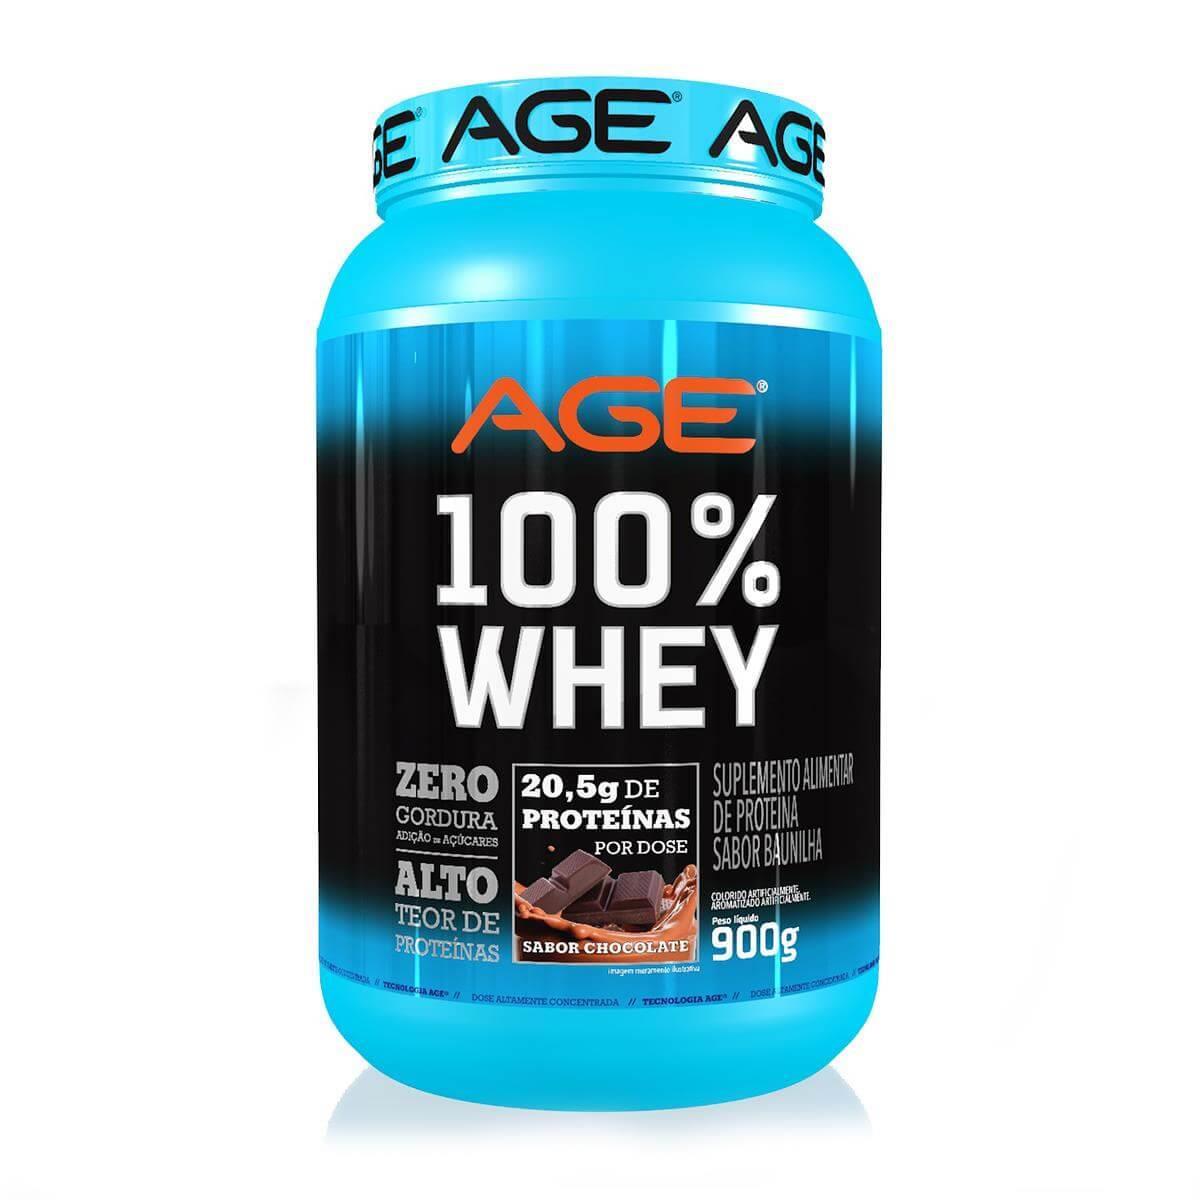 WHEY 100% PURE (900g) - Chocolate - AGE